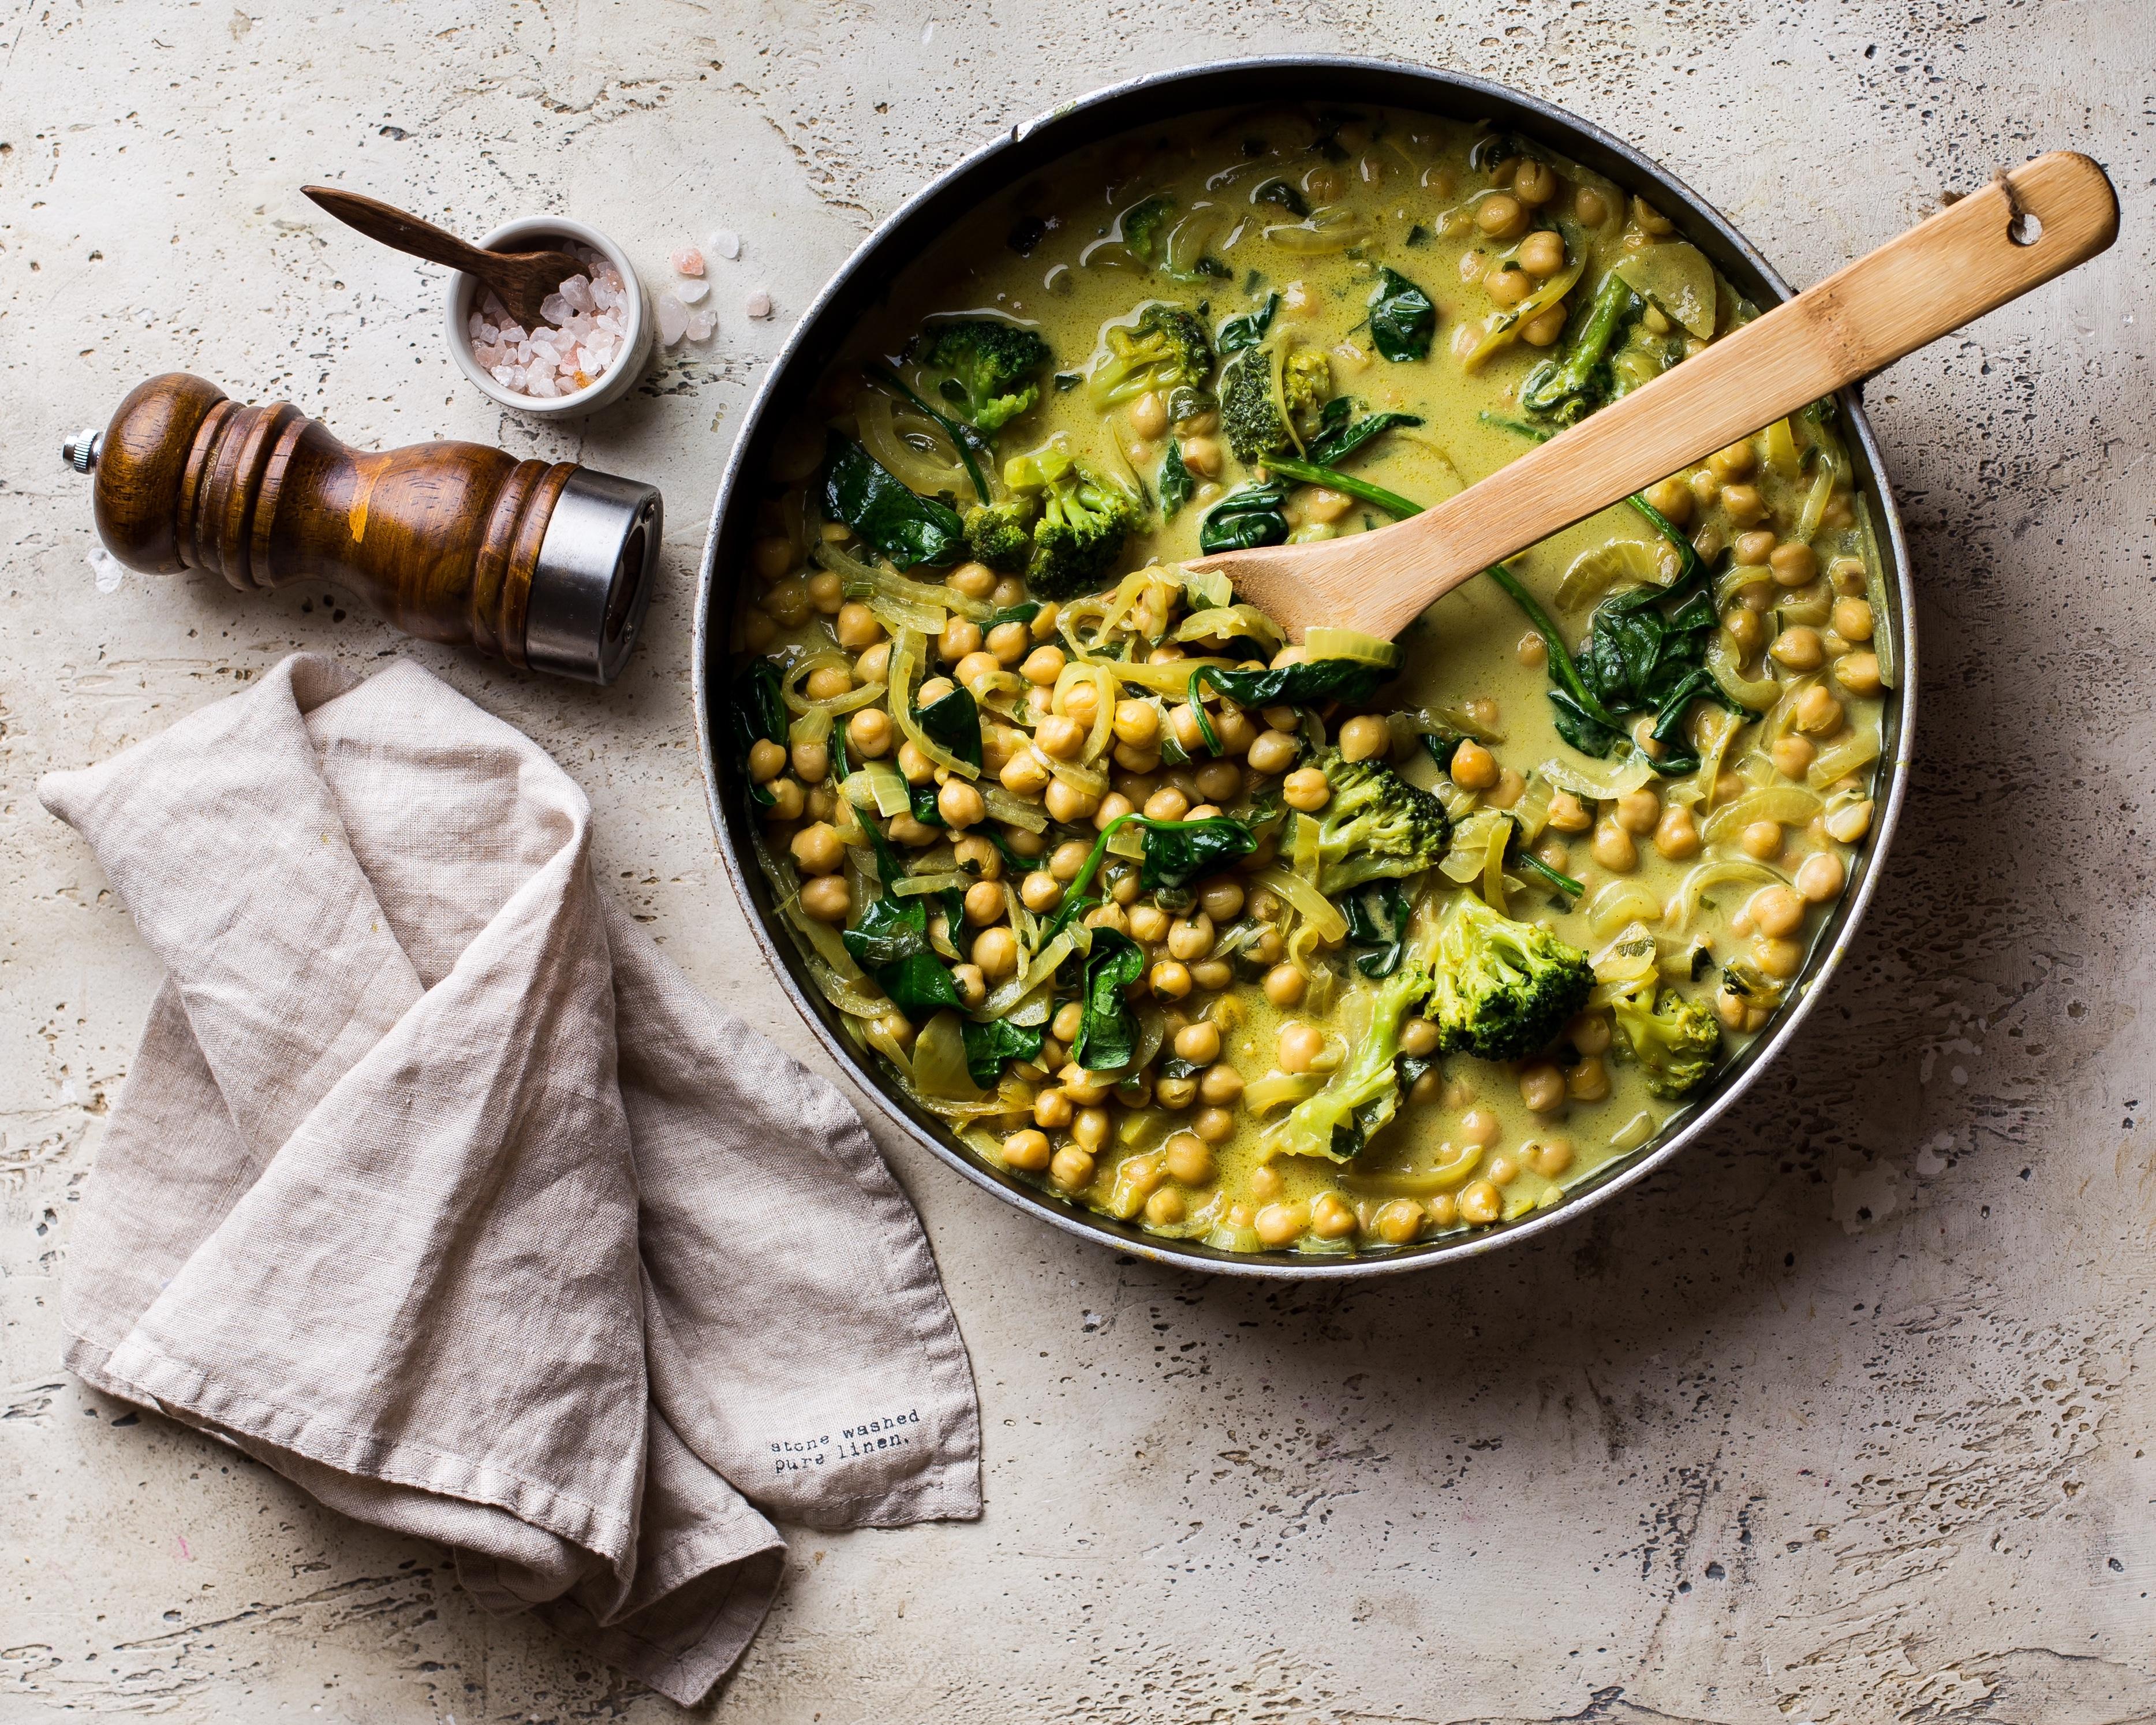 curry nut skovorodka